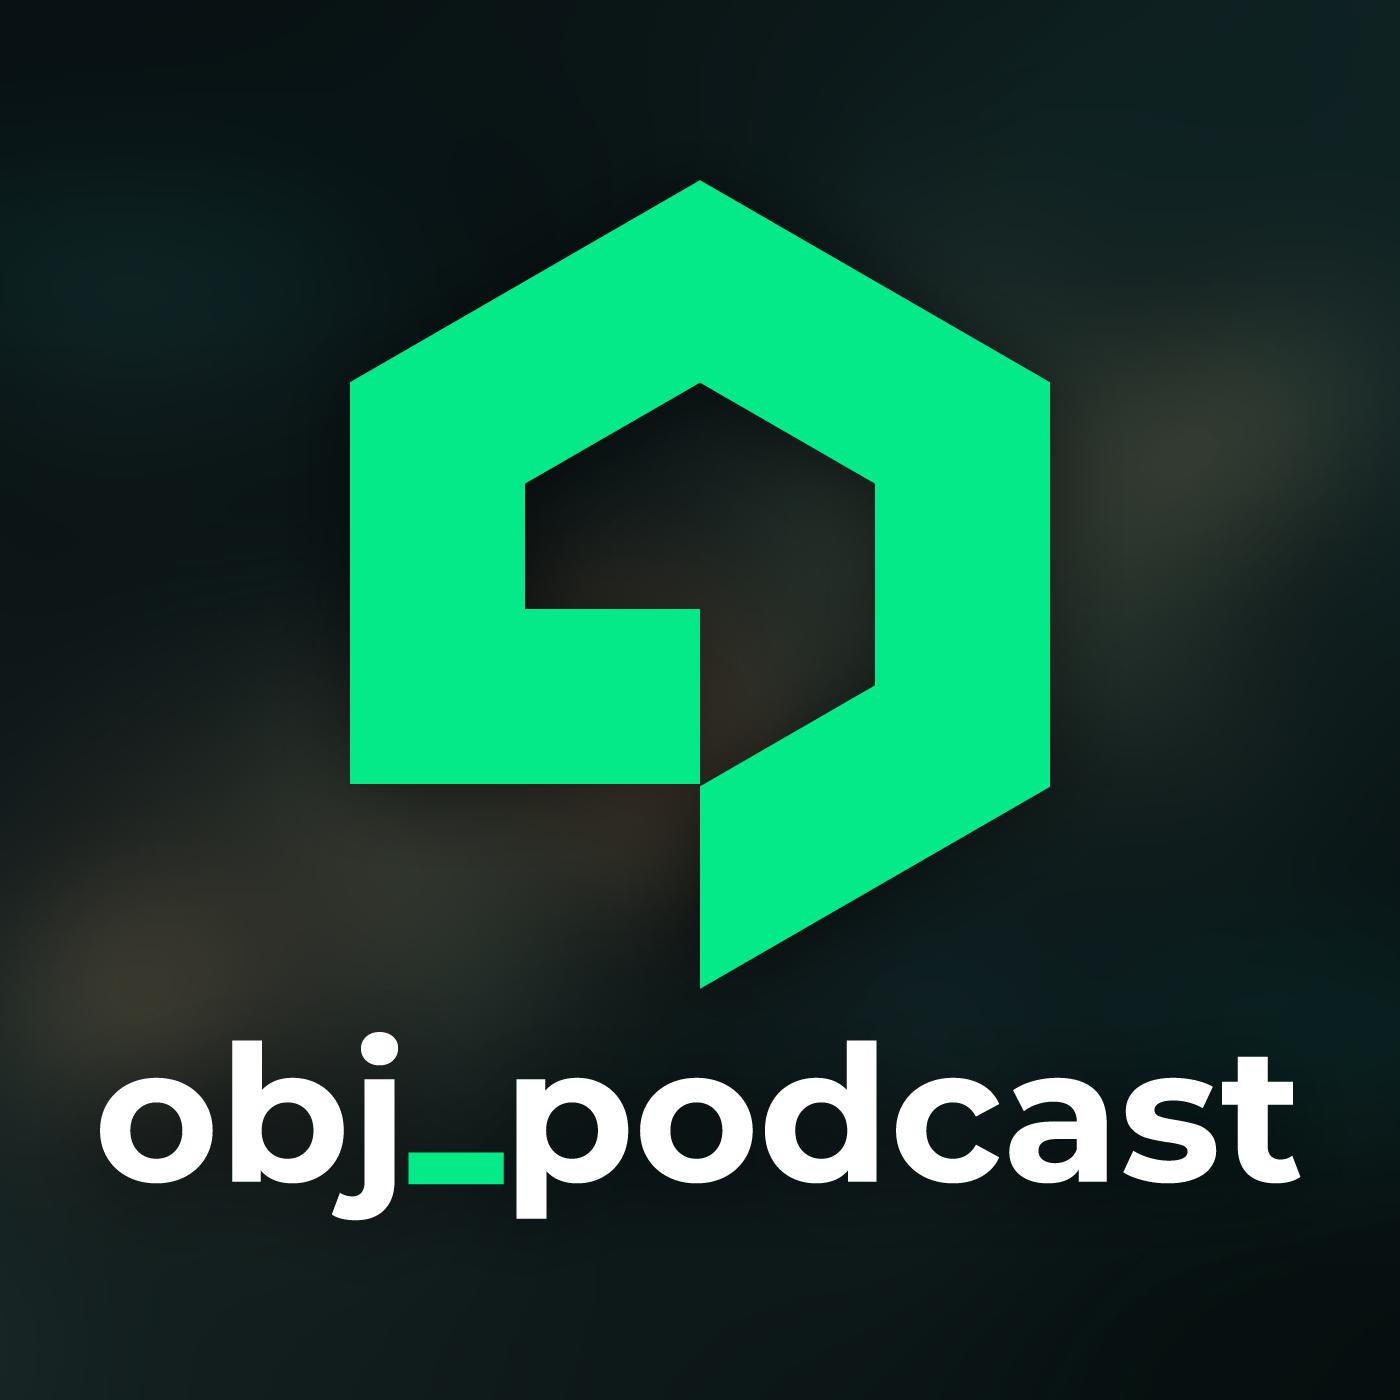 obj_podcast show art